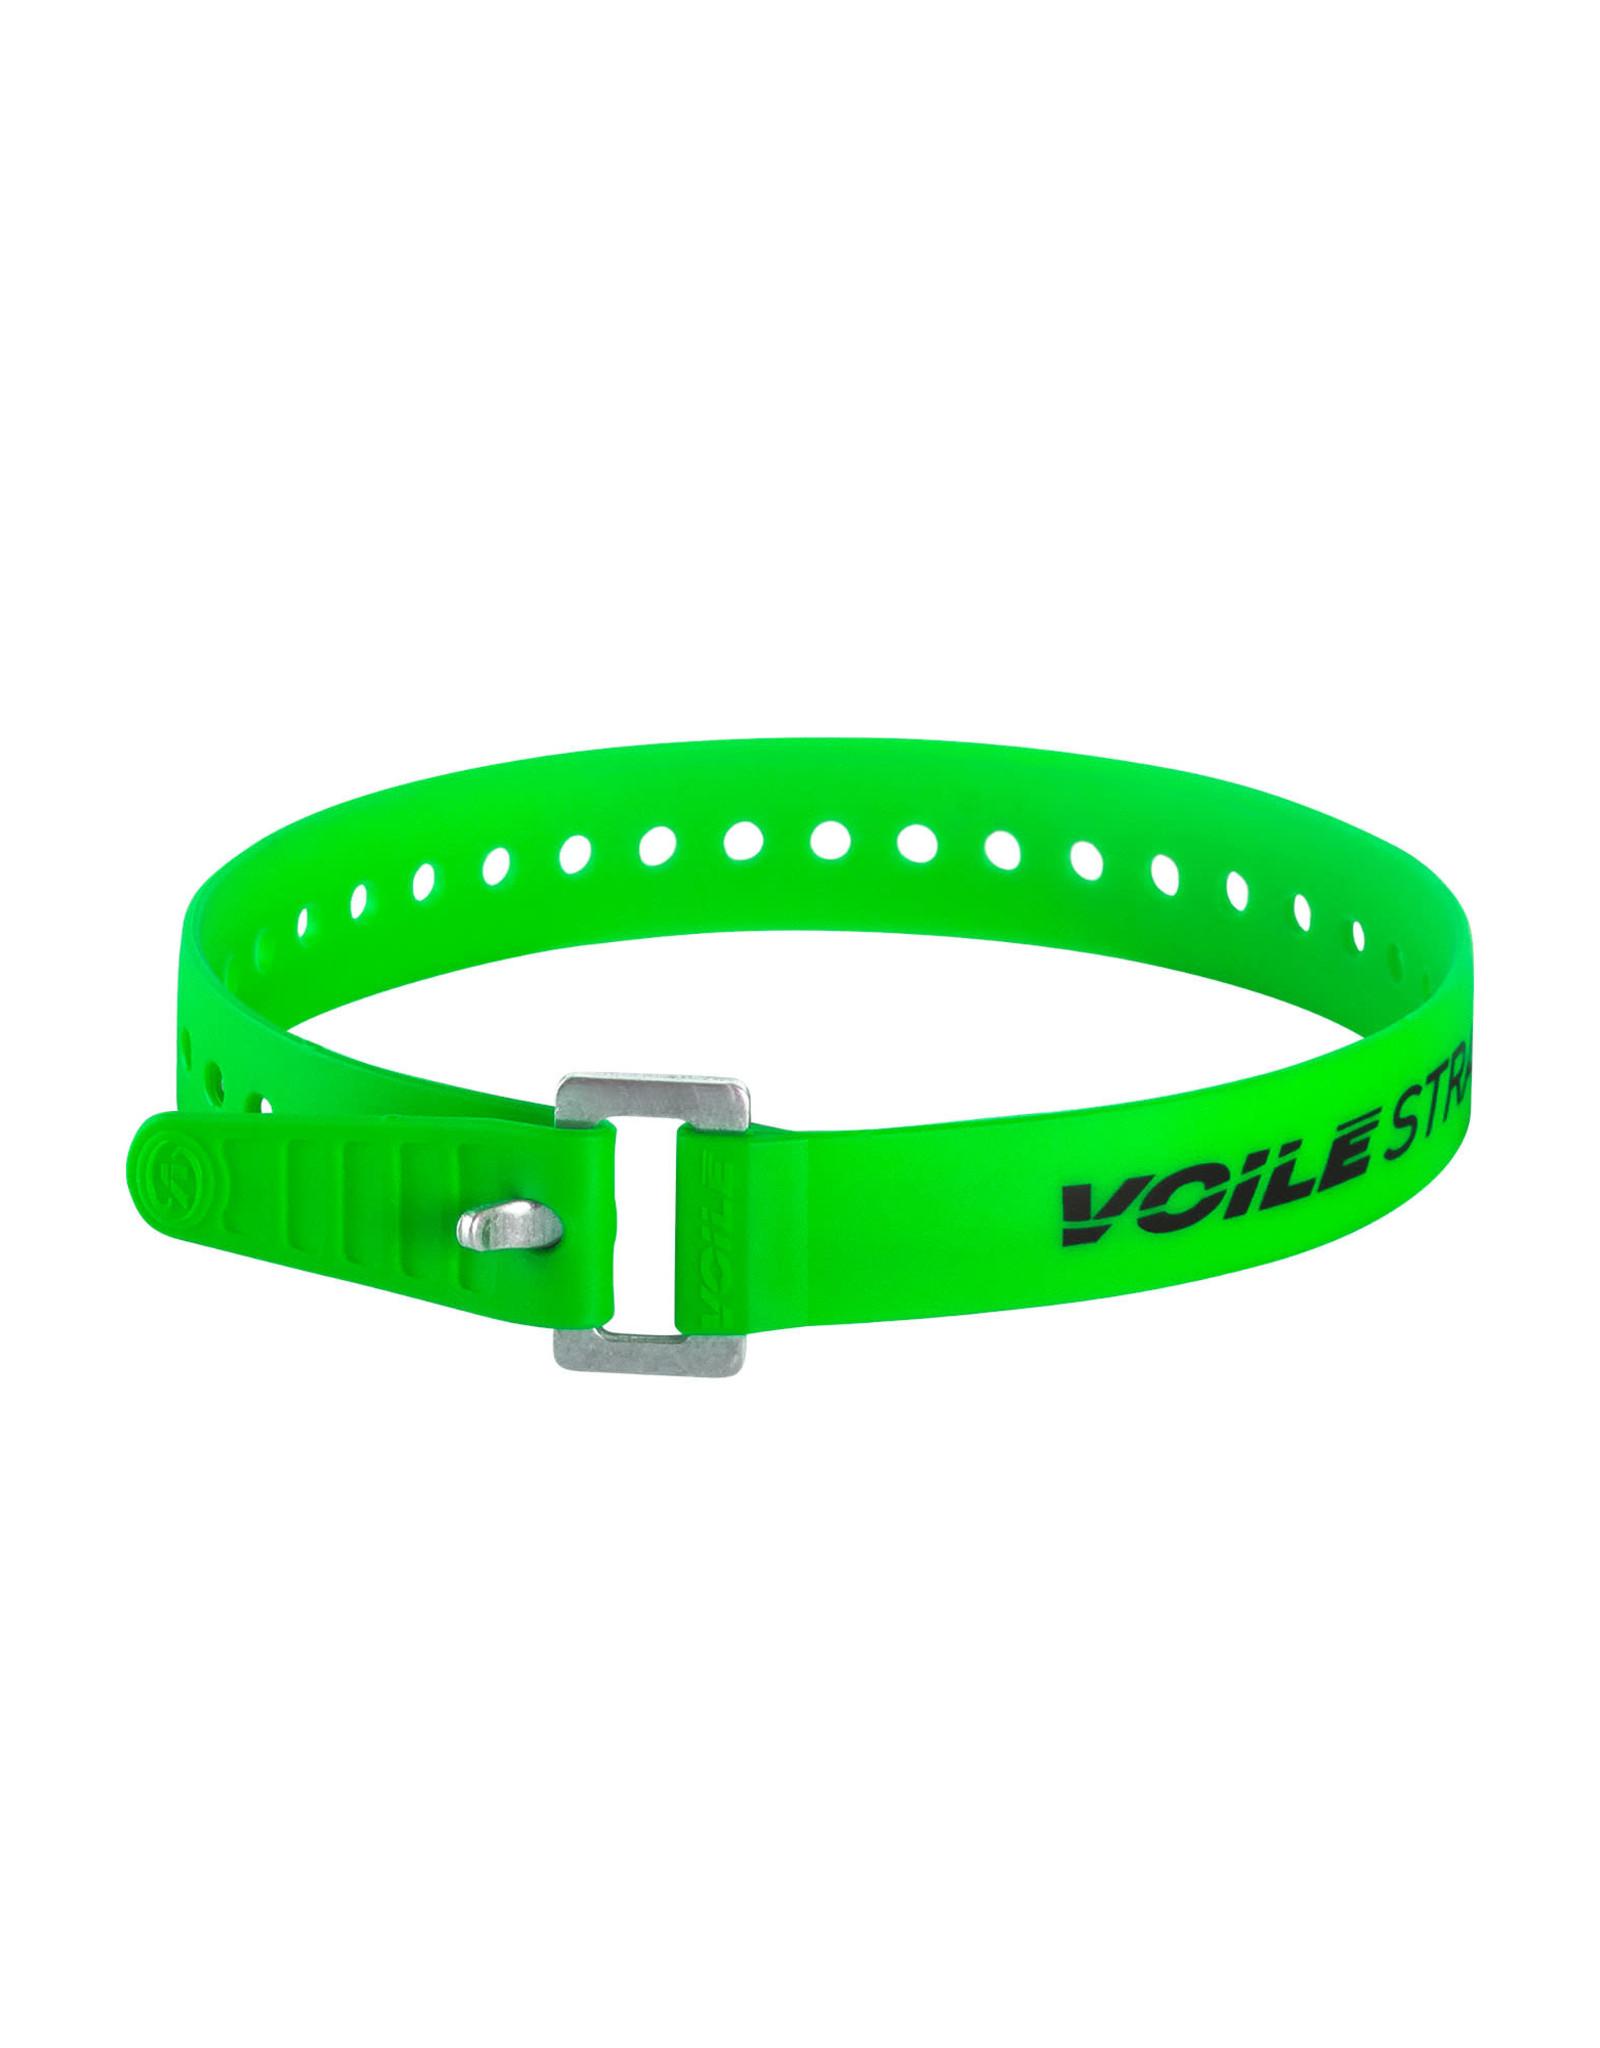 "Voile Voile 2021 Strap XL Series 22"""